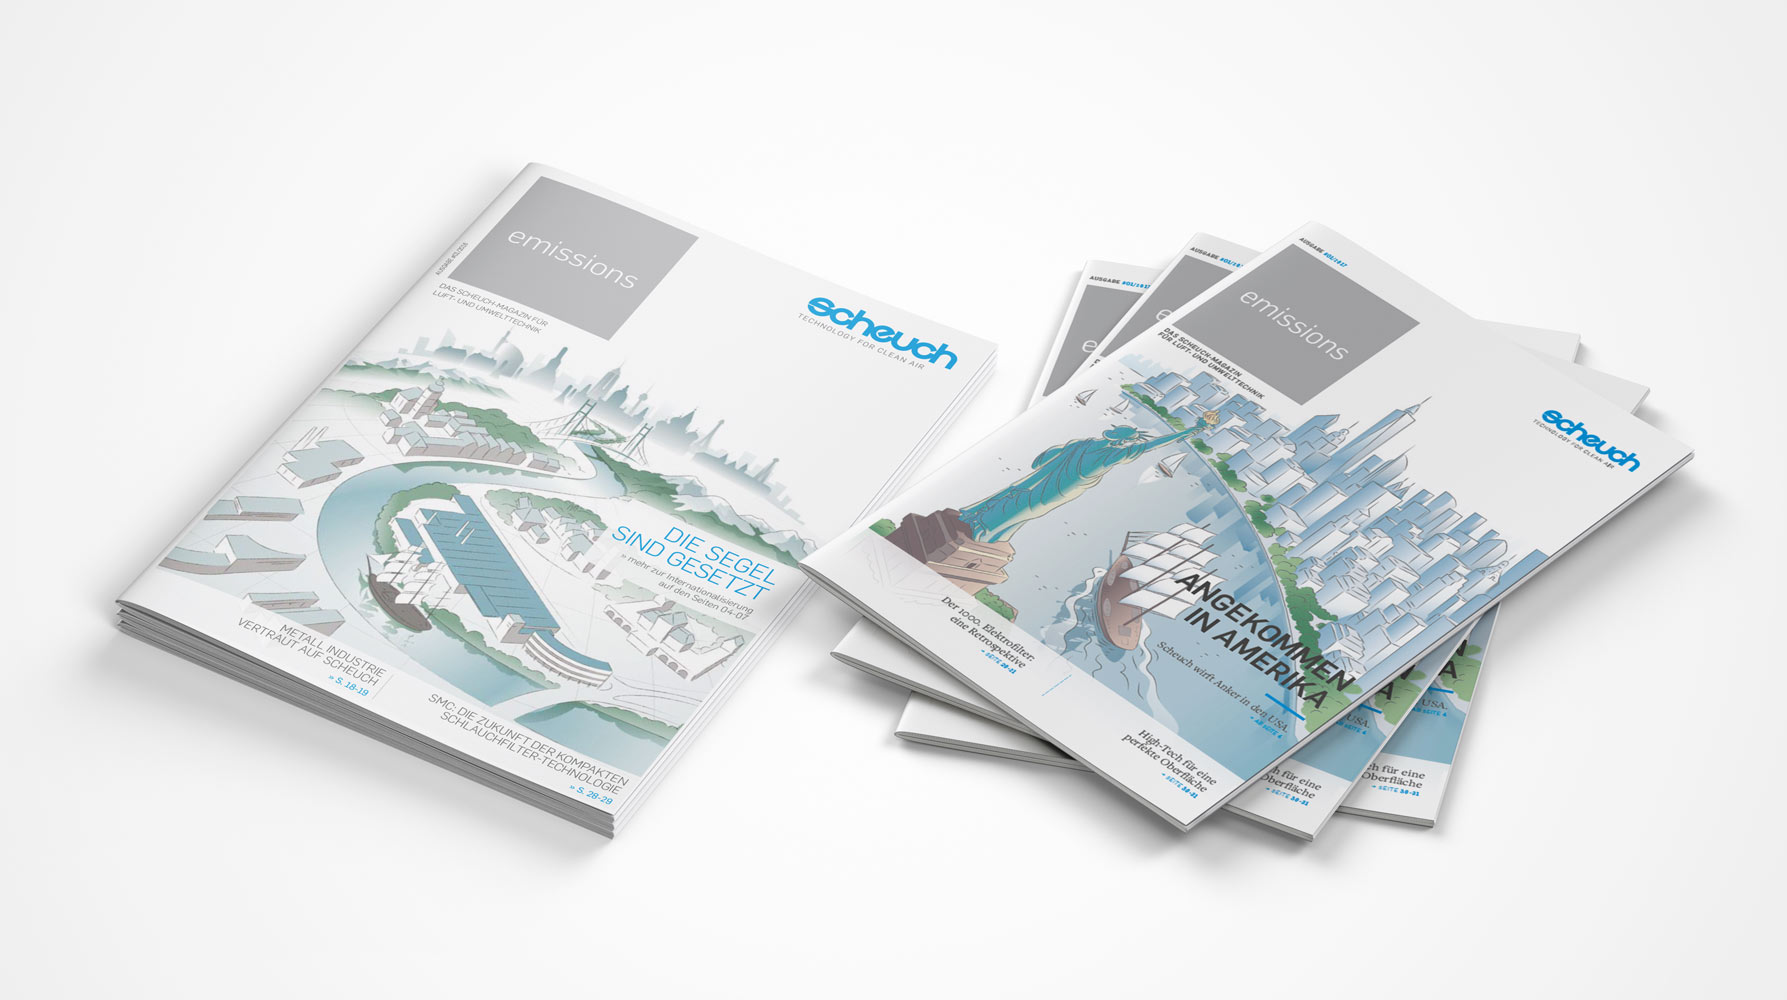 Scheuch A4 Brochure Mockup Mix